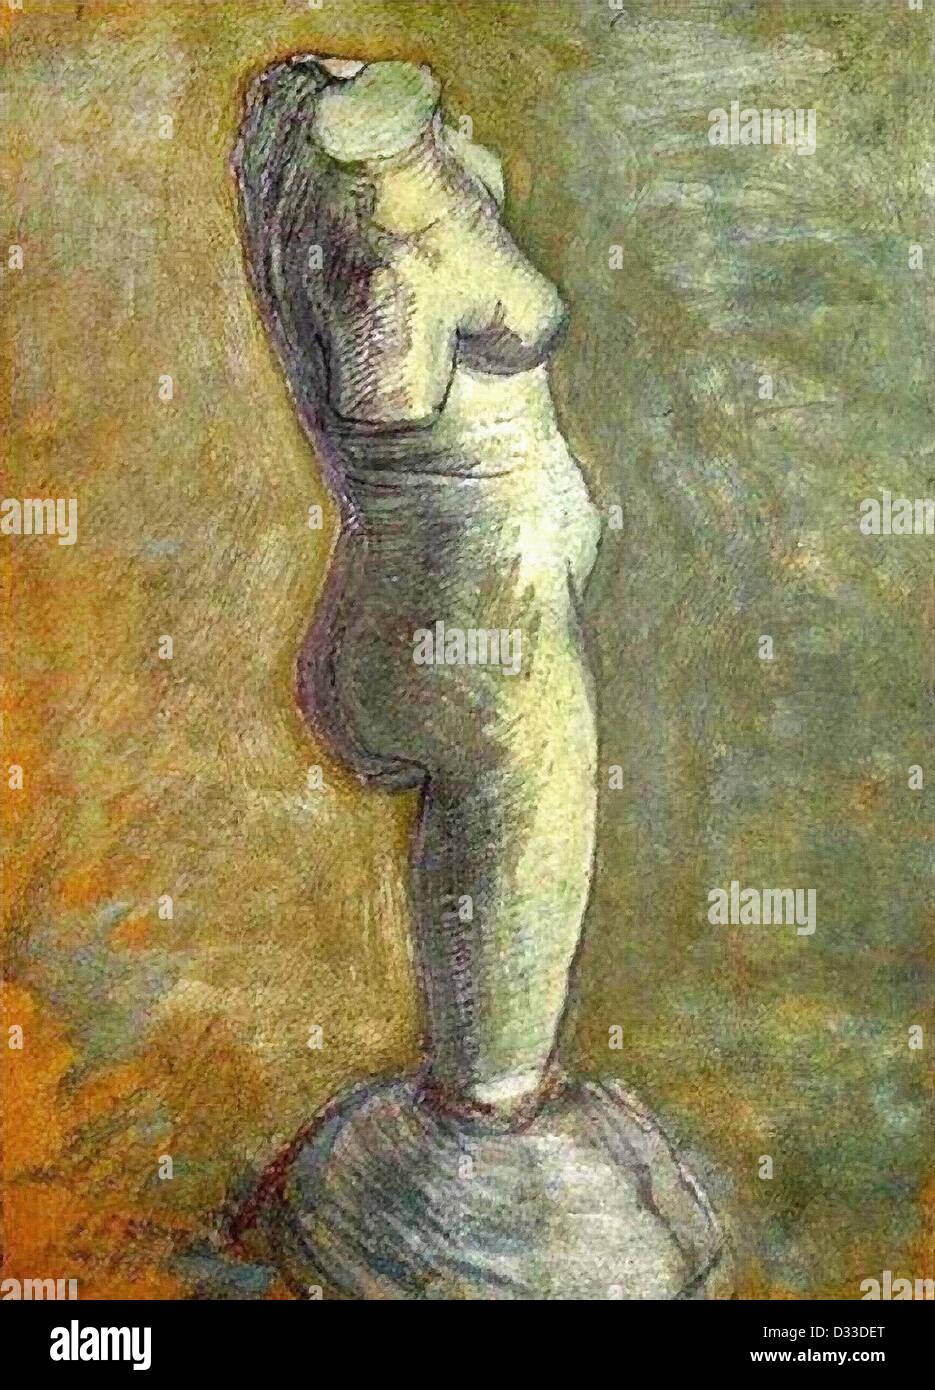 Vincent van Gogh: Plaster Statuette of a Female Torso. 1886. Oil on cardboard. Van Gogh Museum, Amsterdam, Netherlands. - Stock Image